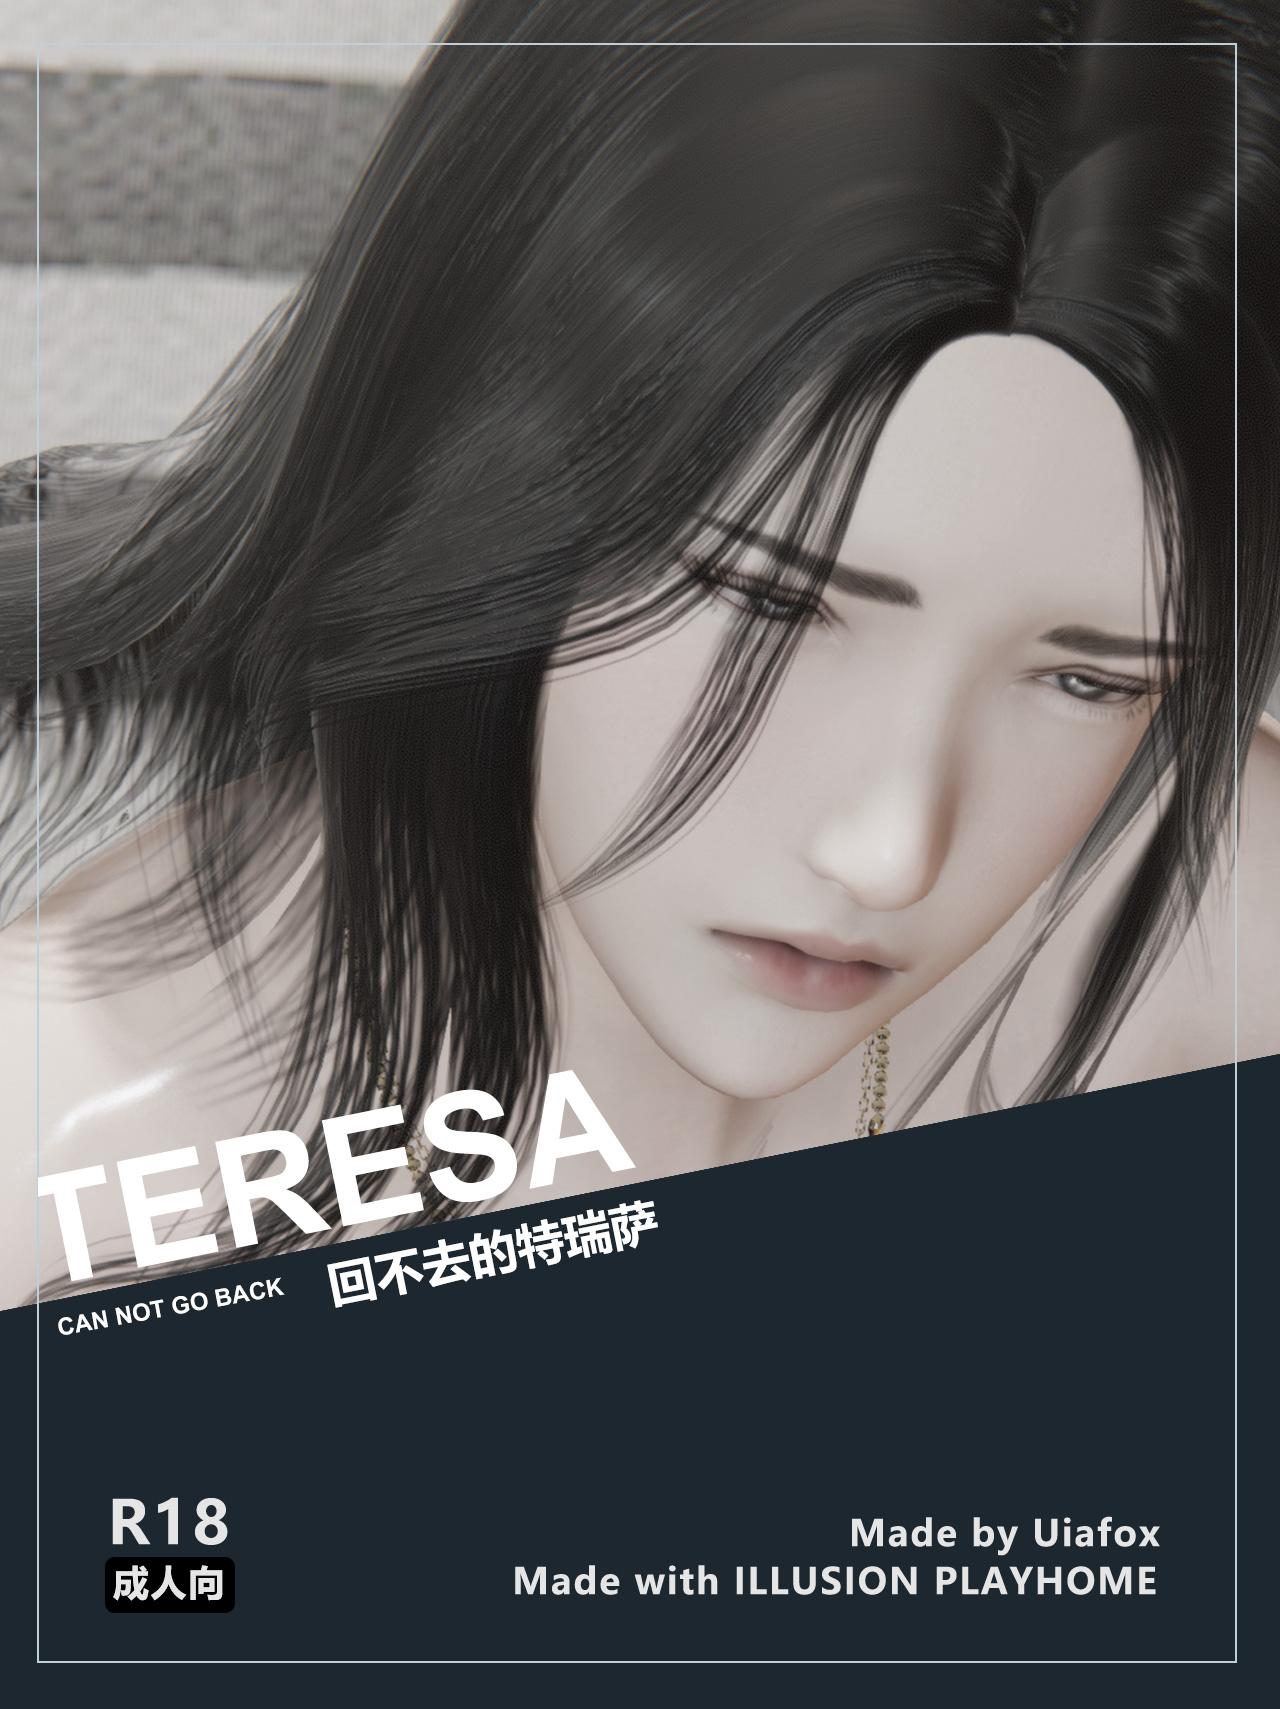 [3D全彩/中文/精美新漫]回不去的特瑞萨:TERESA-CAN NOT GO BACK[239M] 